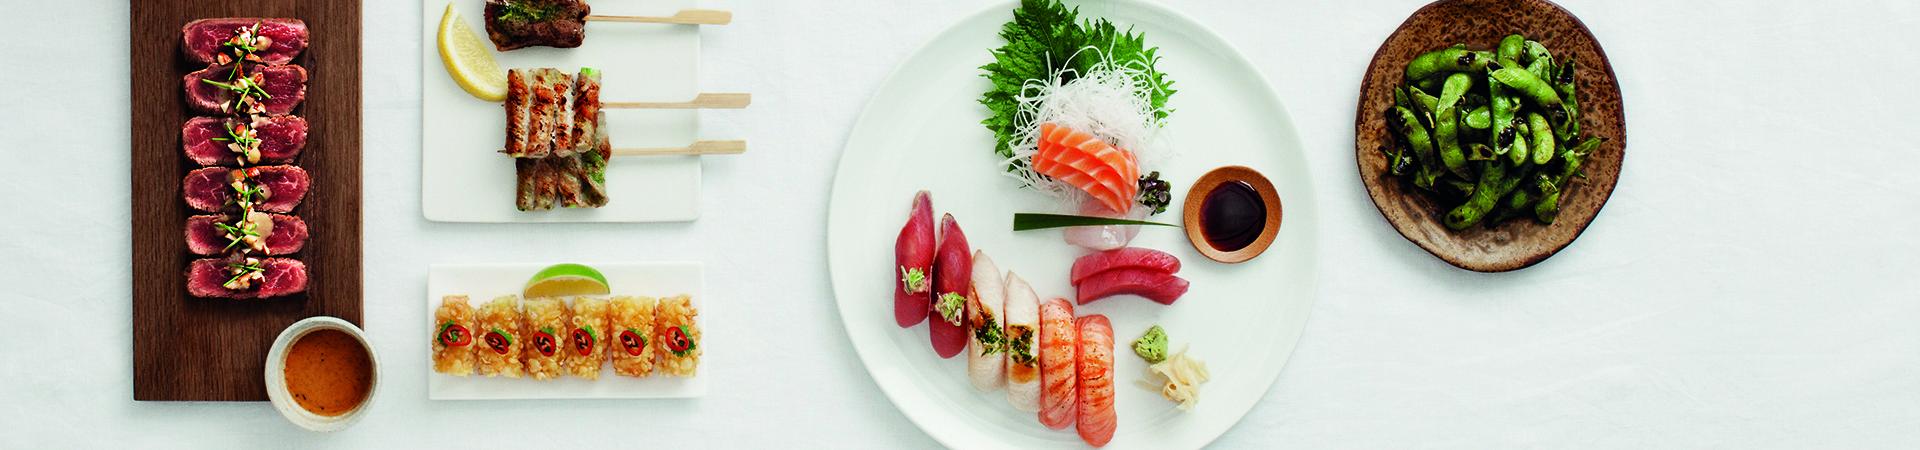 Sticks And Sushi Bestil Sticksnsushi Hos Takeoutdk